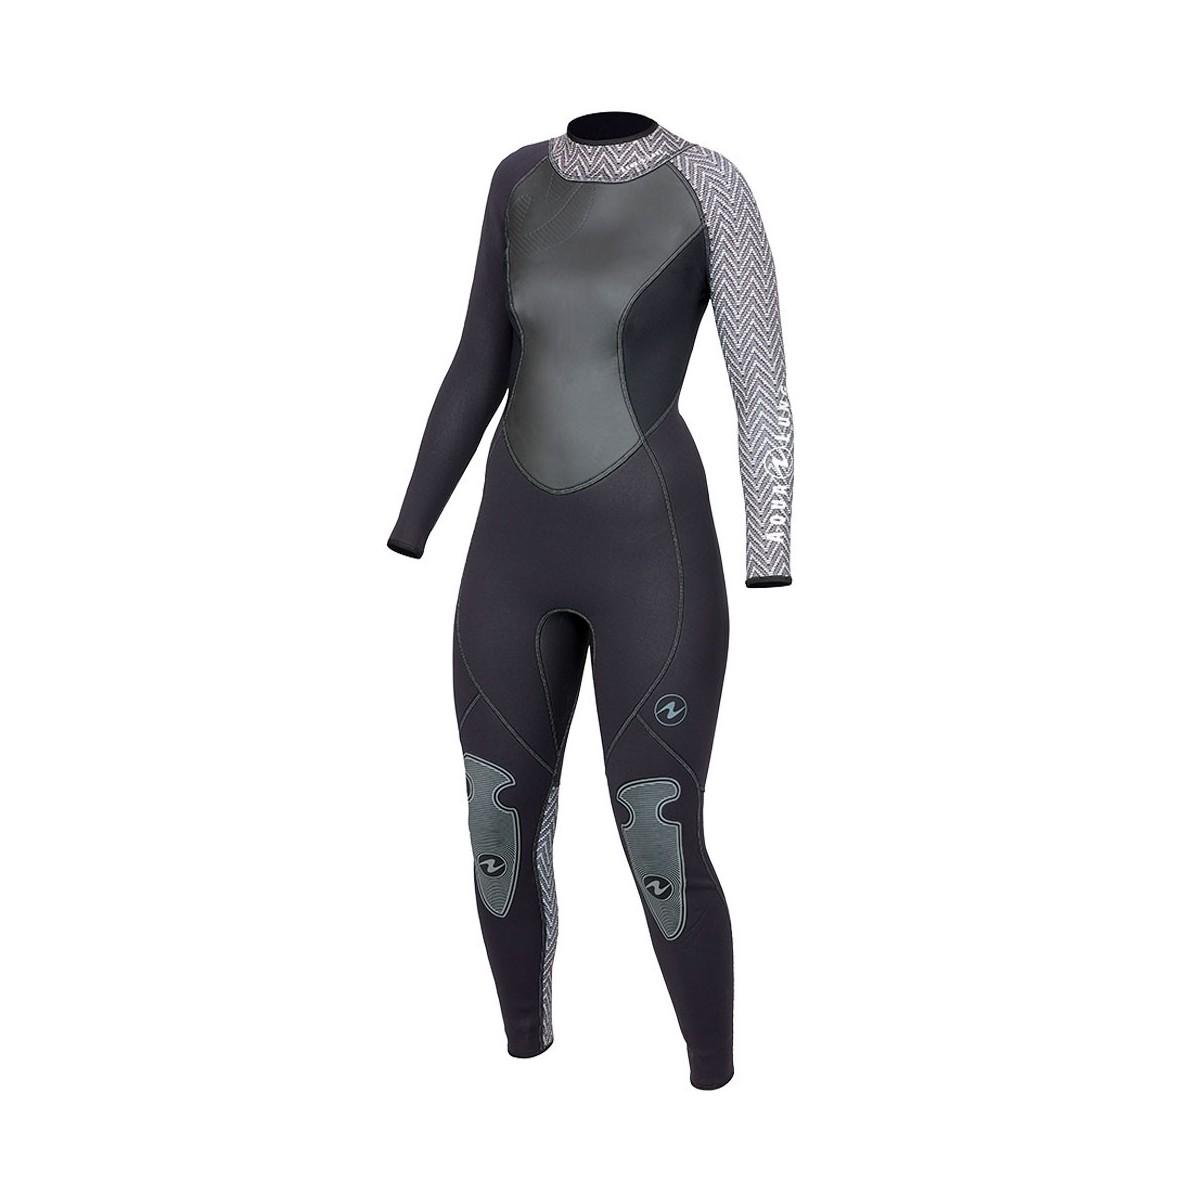 Aqua Lung Women's HydroFlex 3mm Jumpsuit